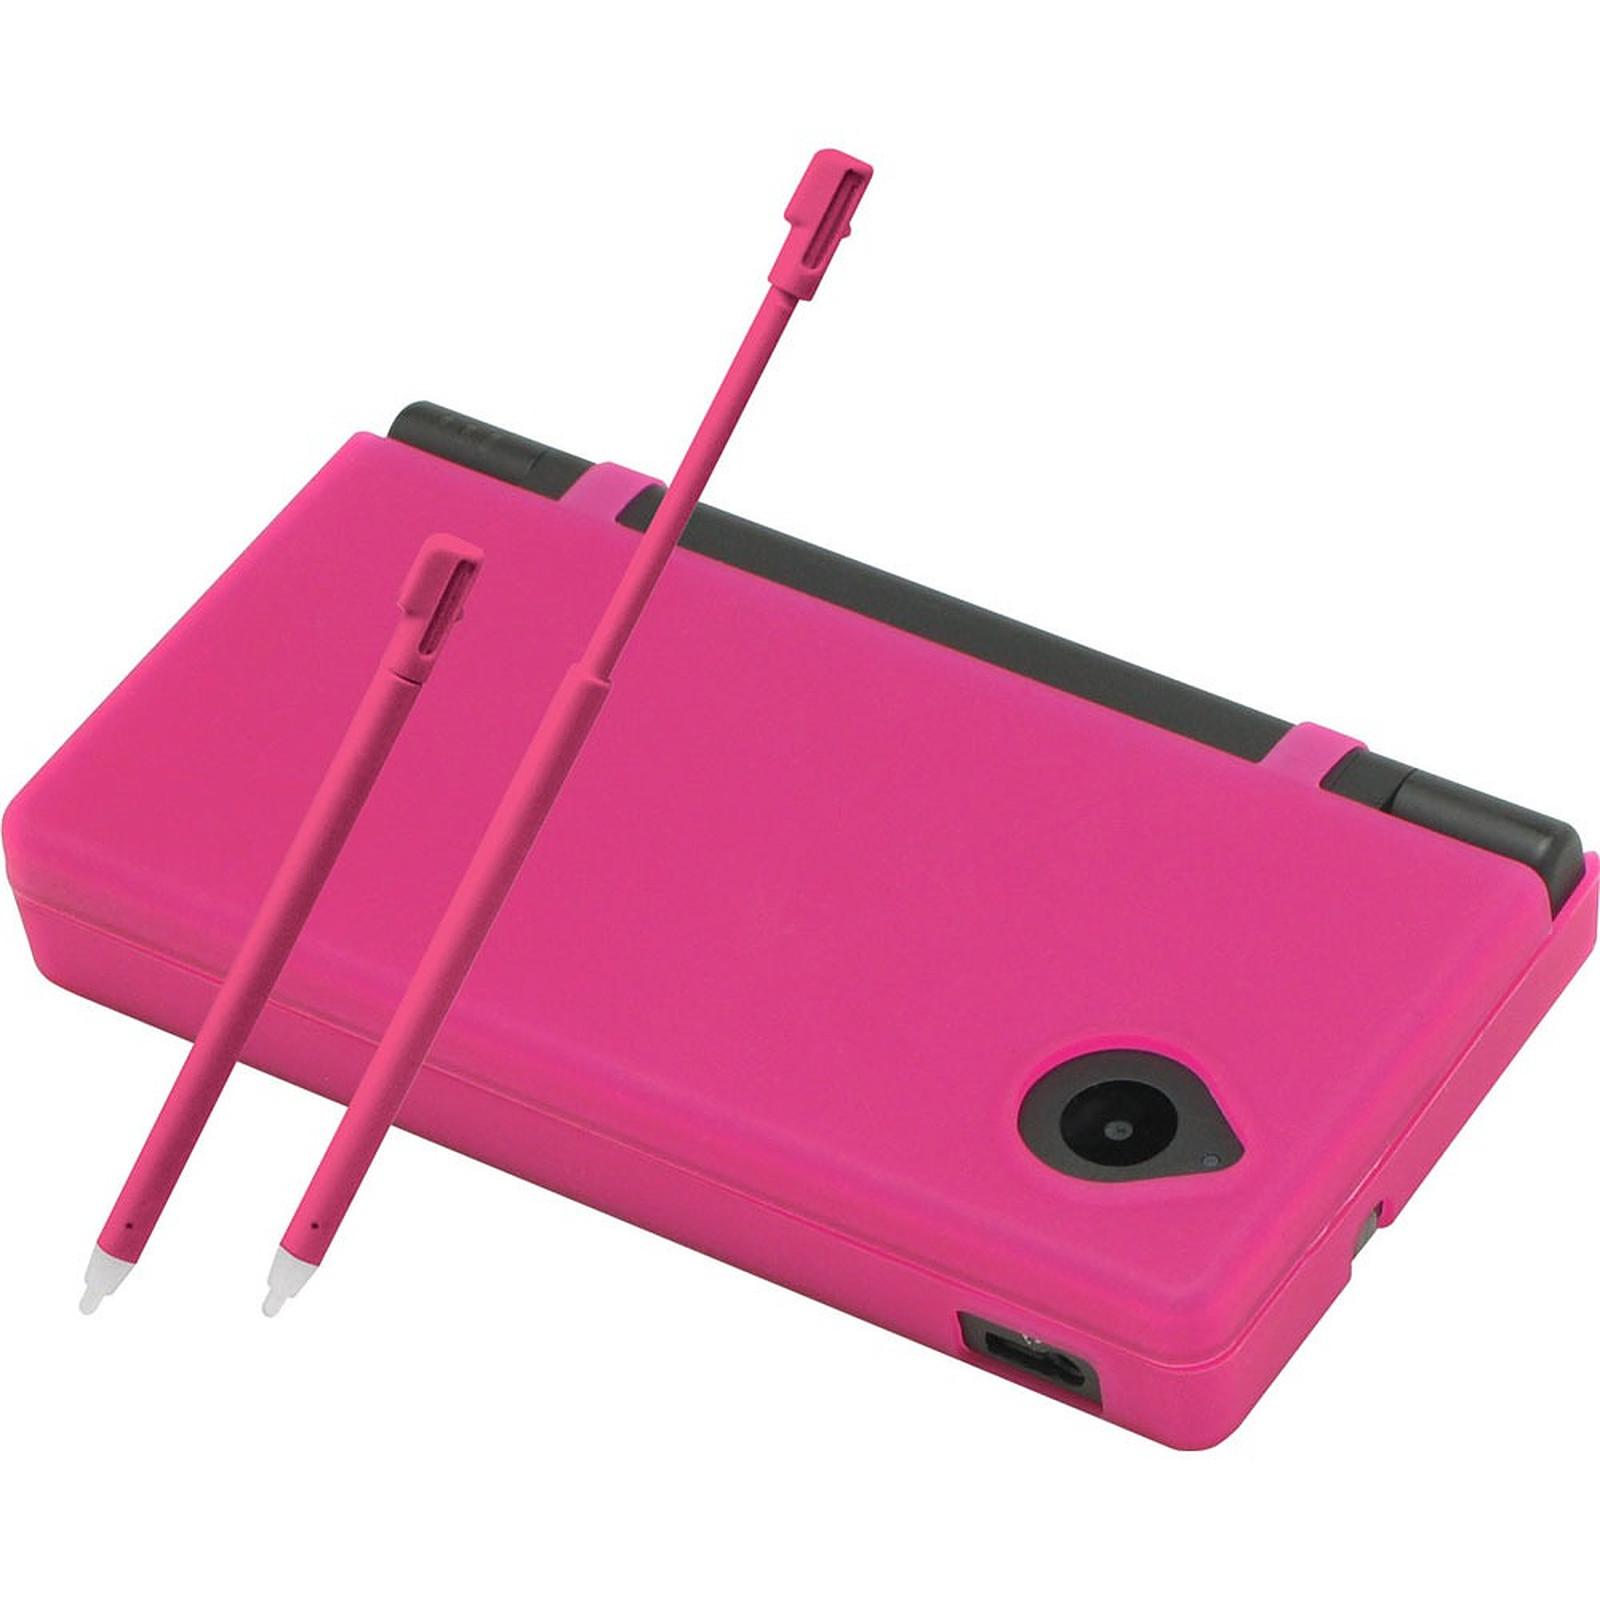 Hori coque silicone + 2 stylets rose (Nintendo DSi)